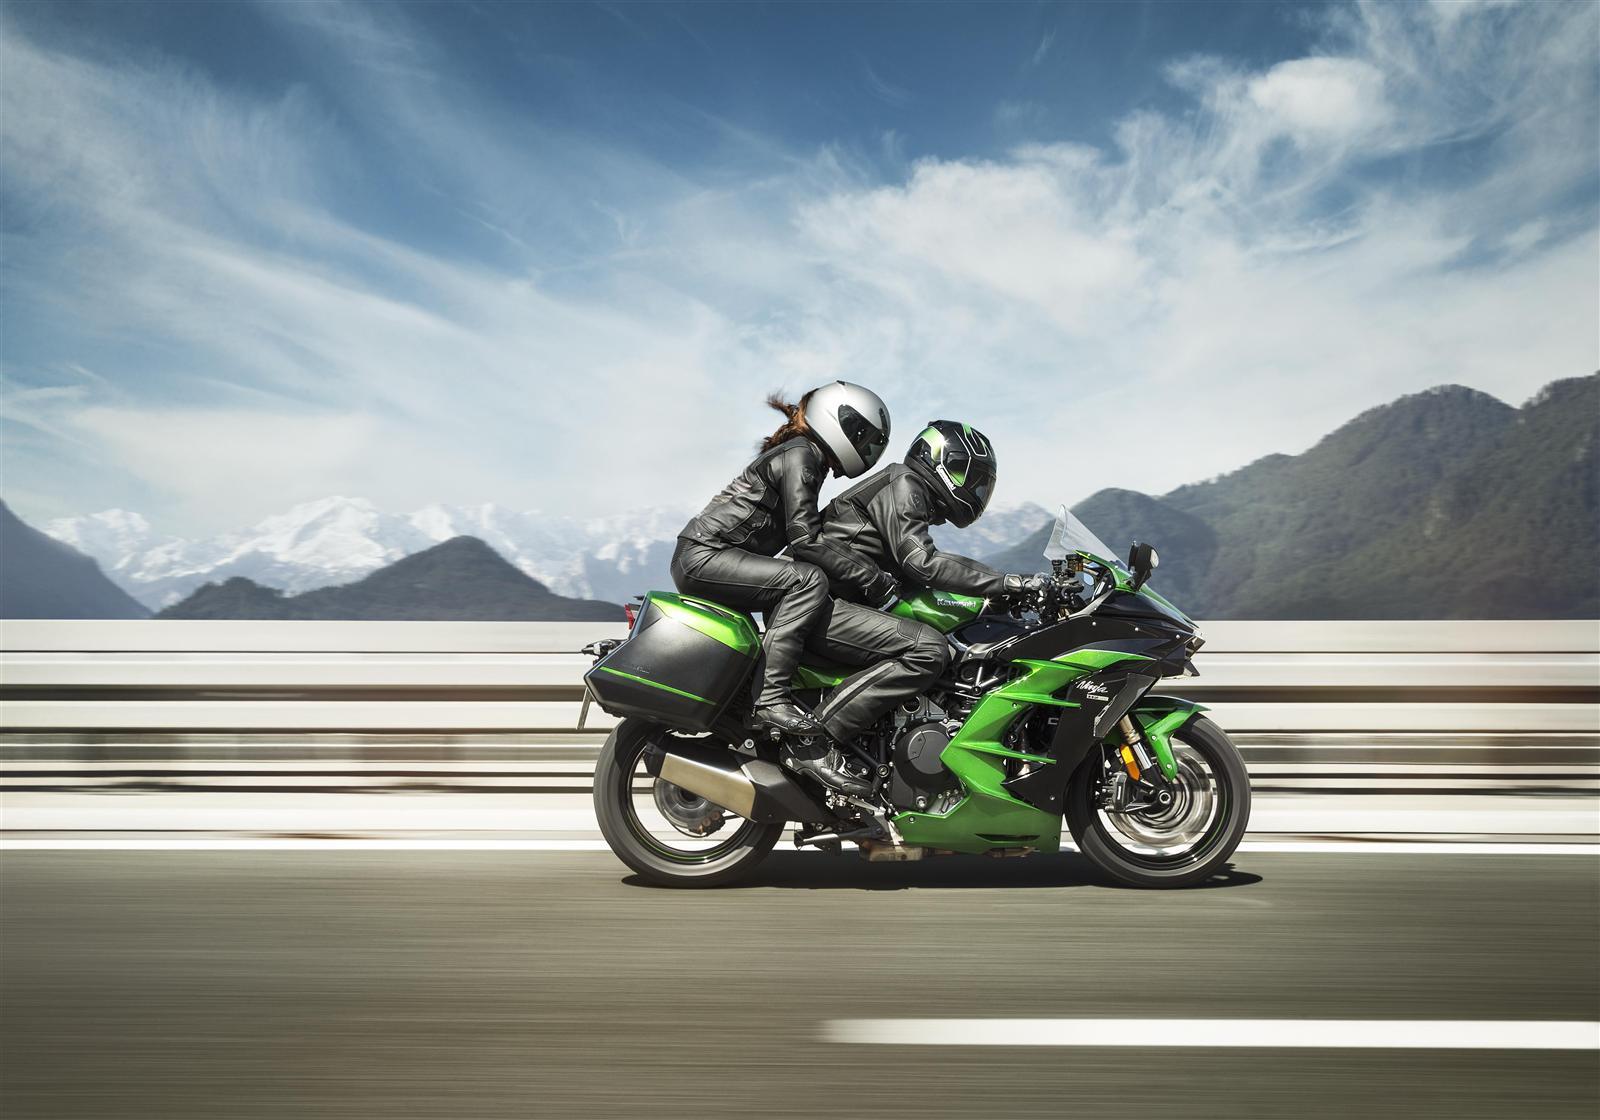 Kawasaki New 2018 Model Prices